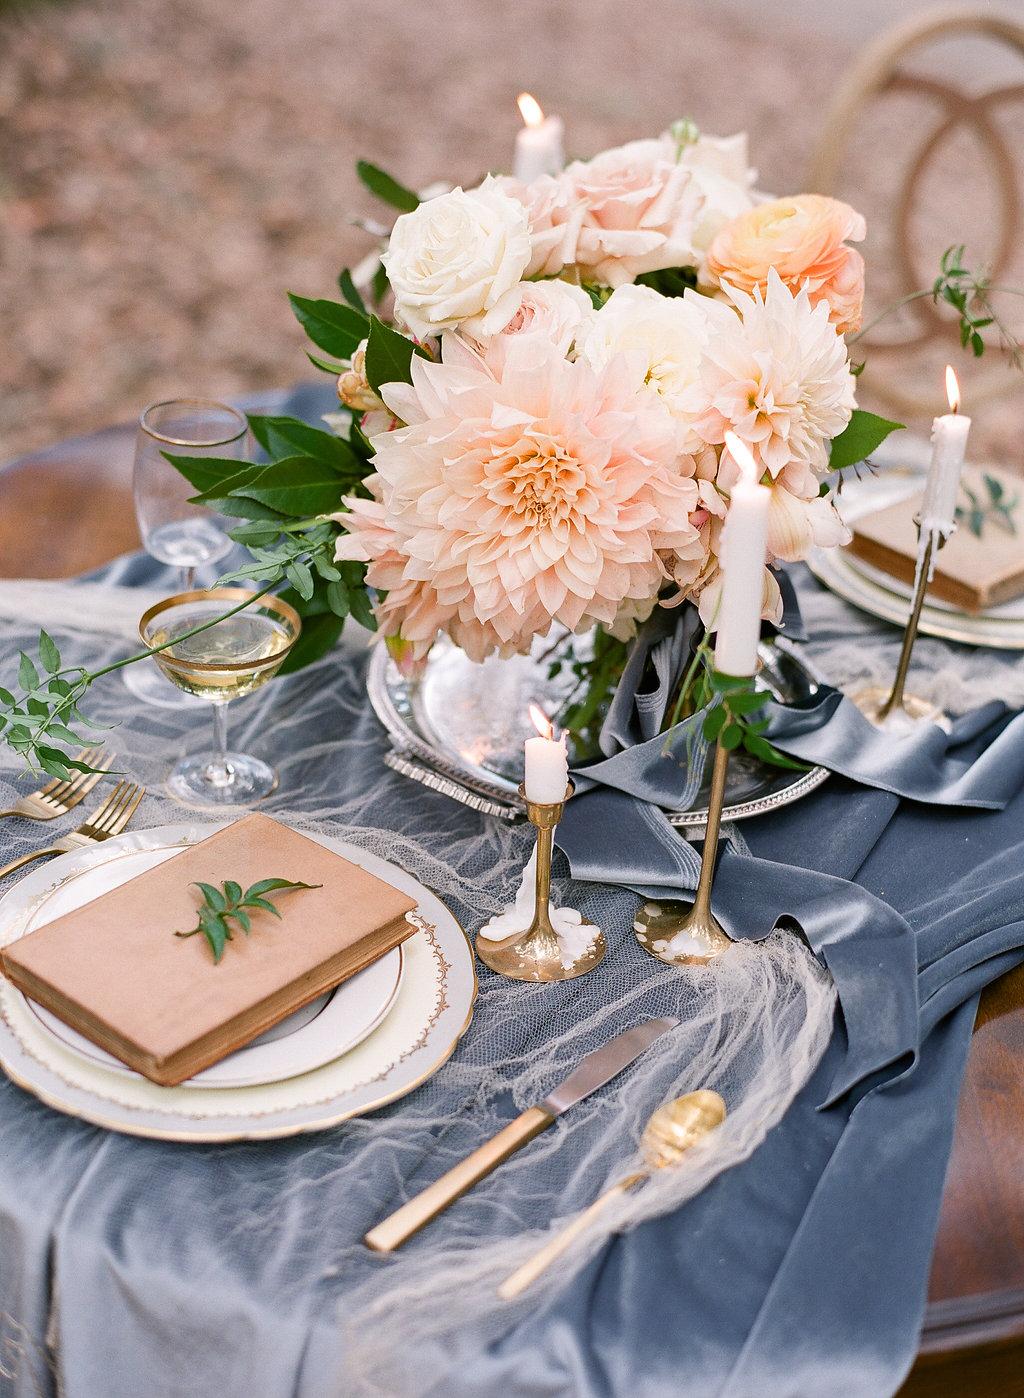 the-happy-bloom-wormsloe-wedding-savannah-wedding-ivory-and-beau-bridal-boutique-savannah-wedding-dresses-savannah-bridal-boutique-georgia-bridal-boutique-design-studio-south-sunset-wedding-blush-by-hayley-paige-candi-1550-blush-wedding-dress-8.jpg